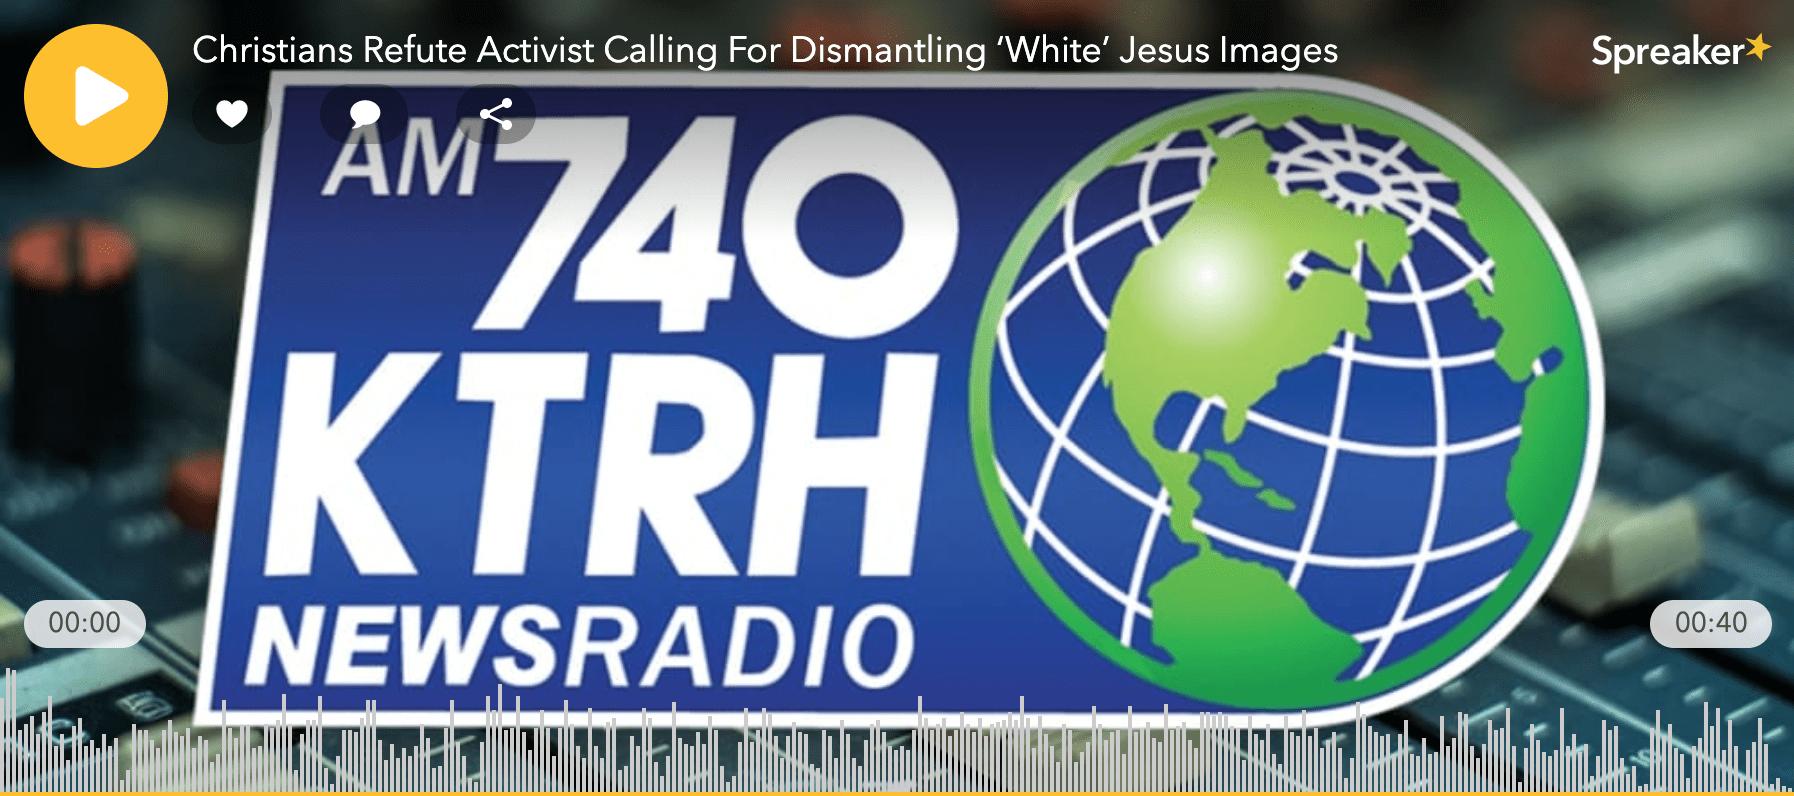 Christians Refute Activist Calling For Dismantling 'White' Jesus Images